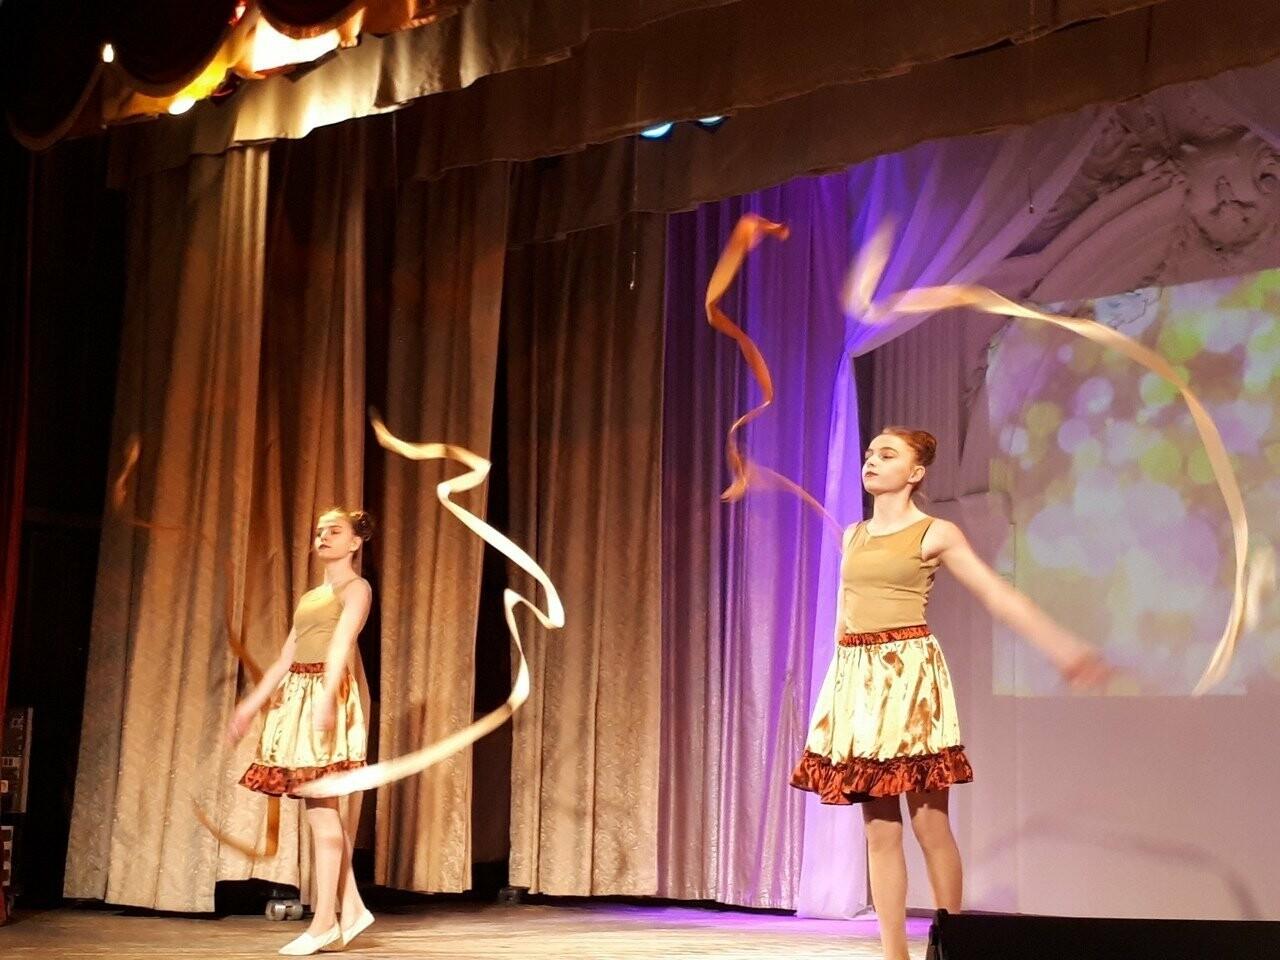 В Пушкинском доме культуры подвели итоги конкурса «Творчество без границ», фото-2